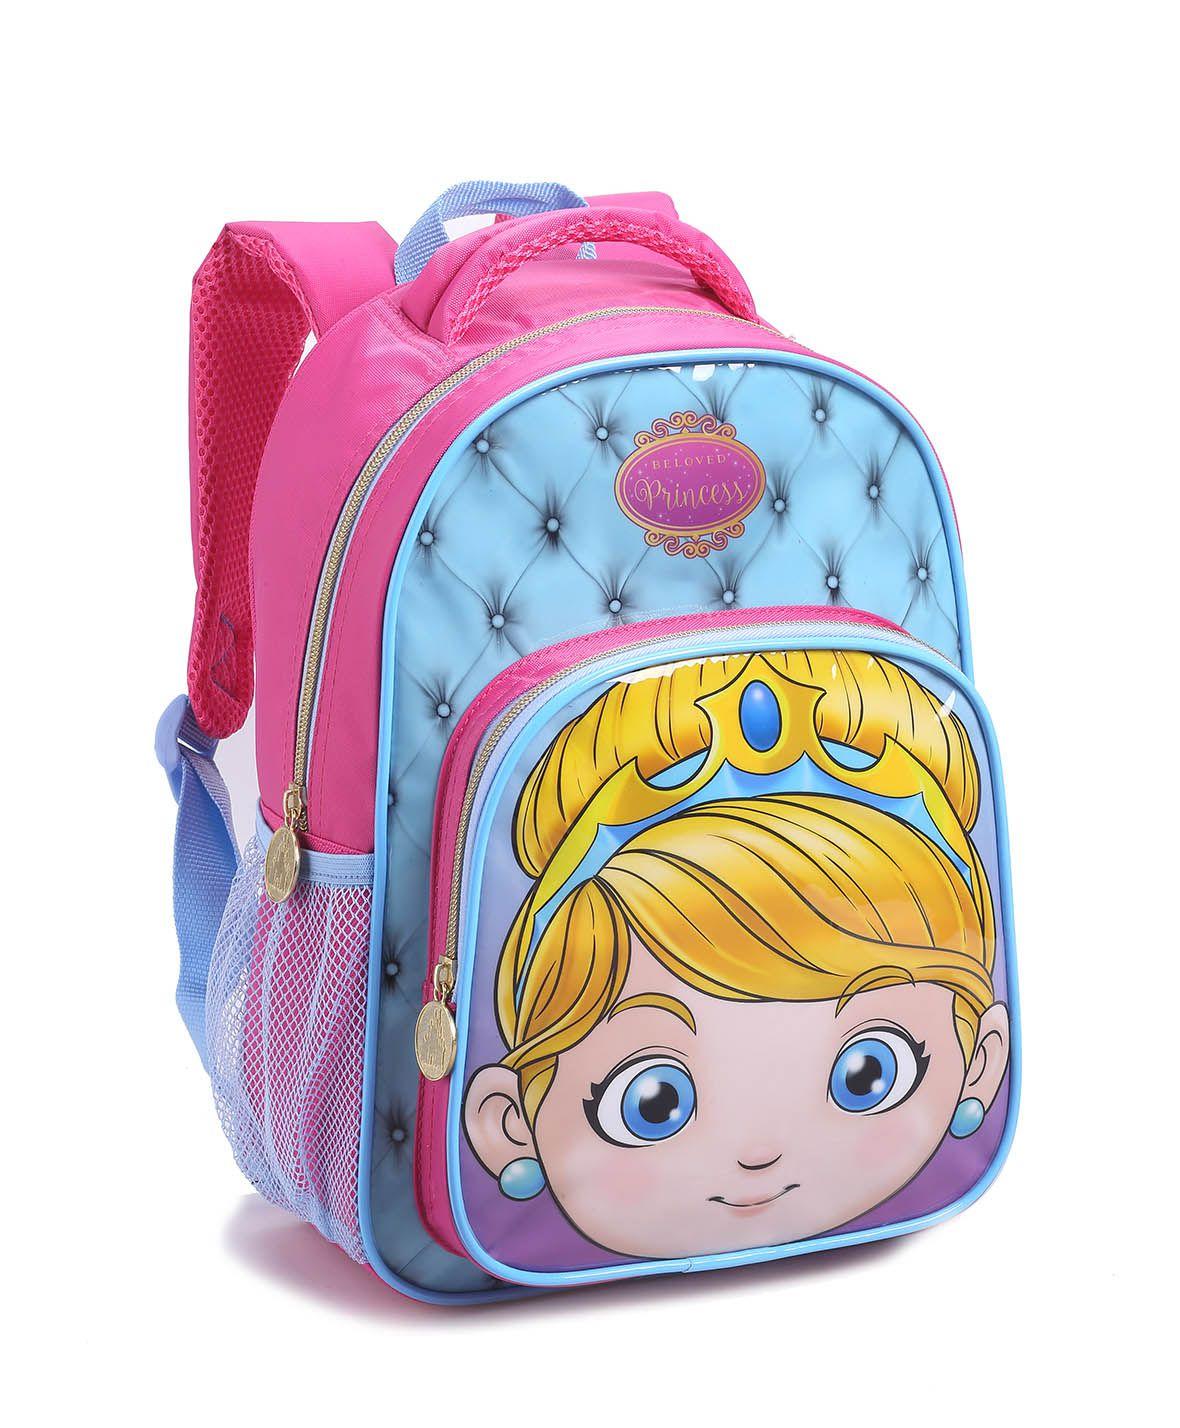 Mochila Infantil Menina Seanite 14483 Princesinha Fofa Rosa